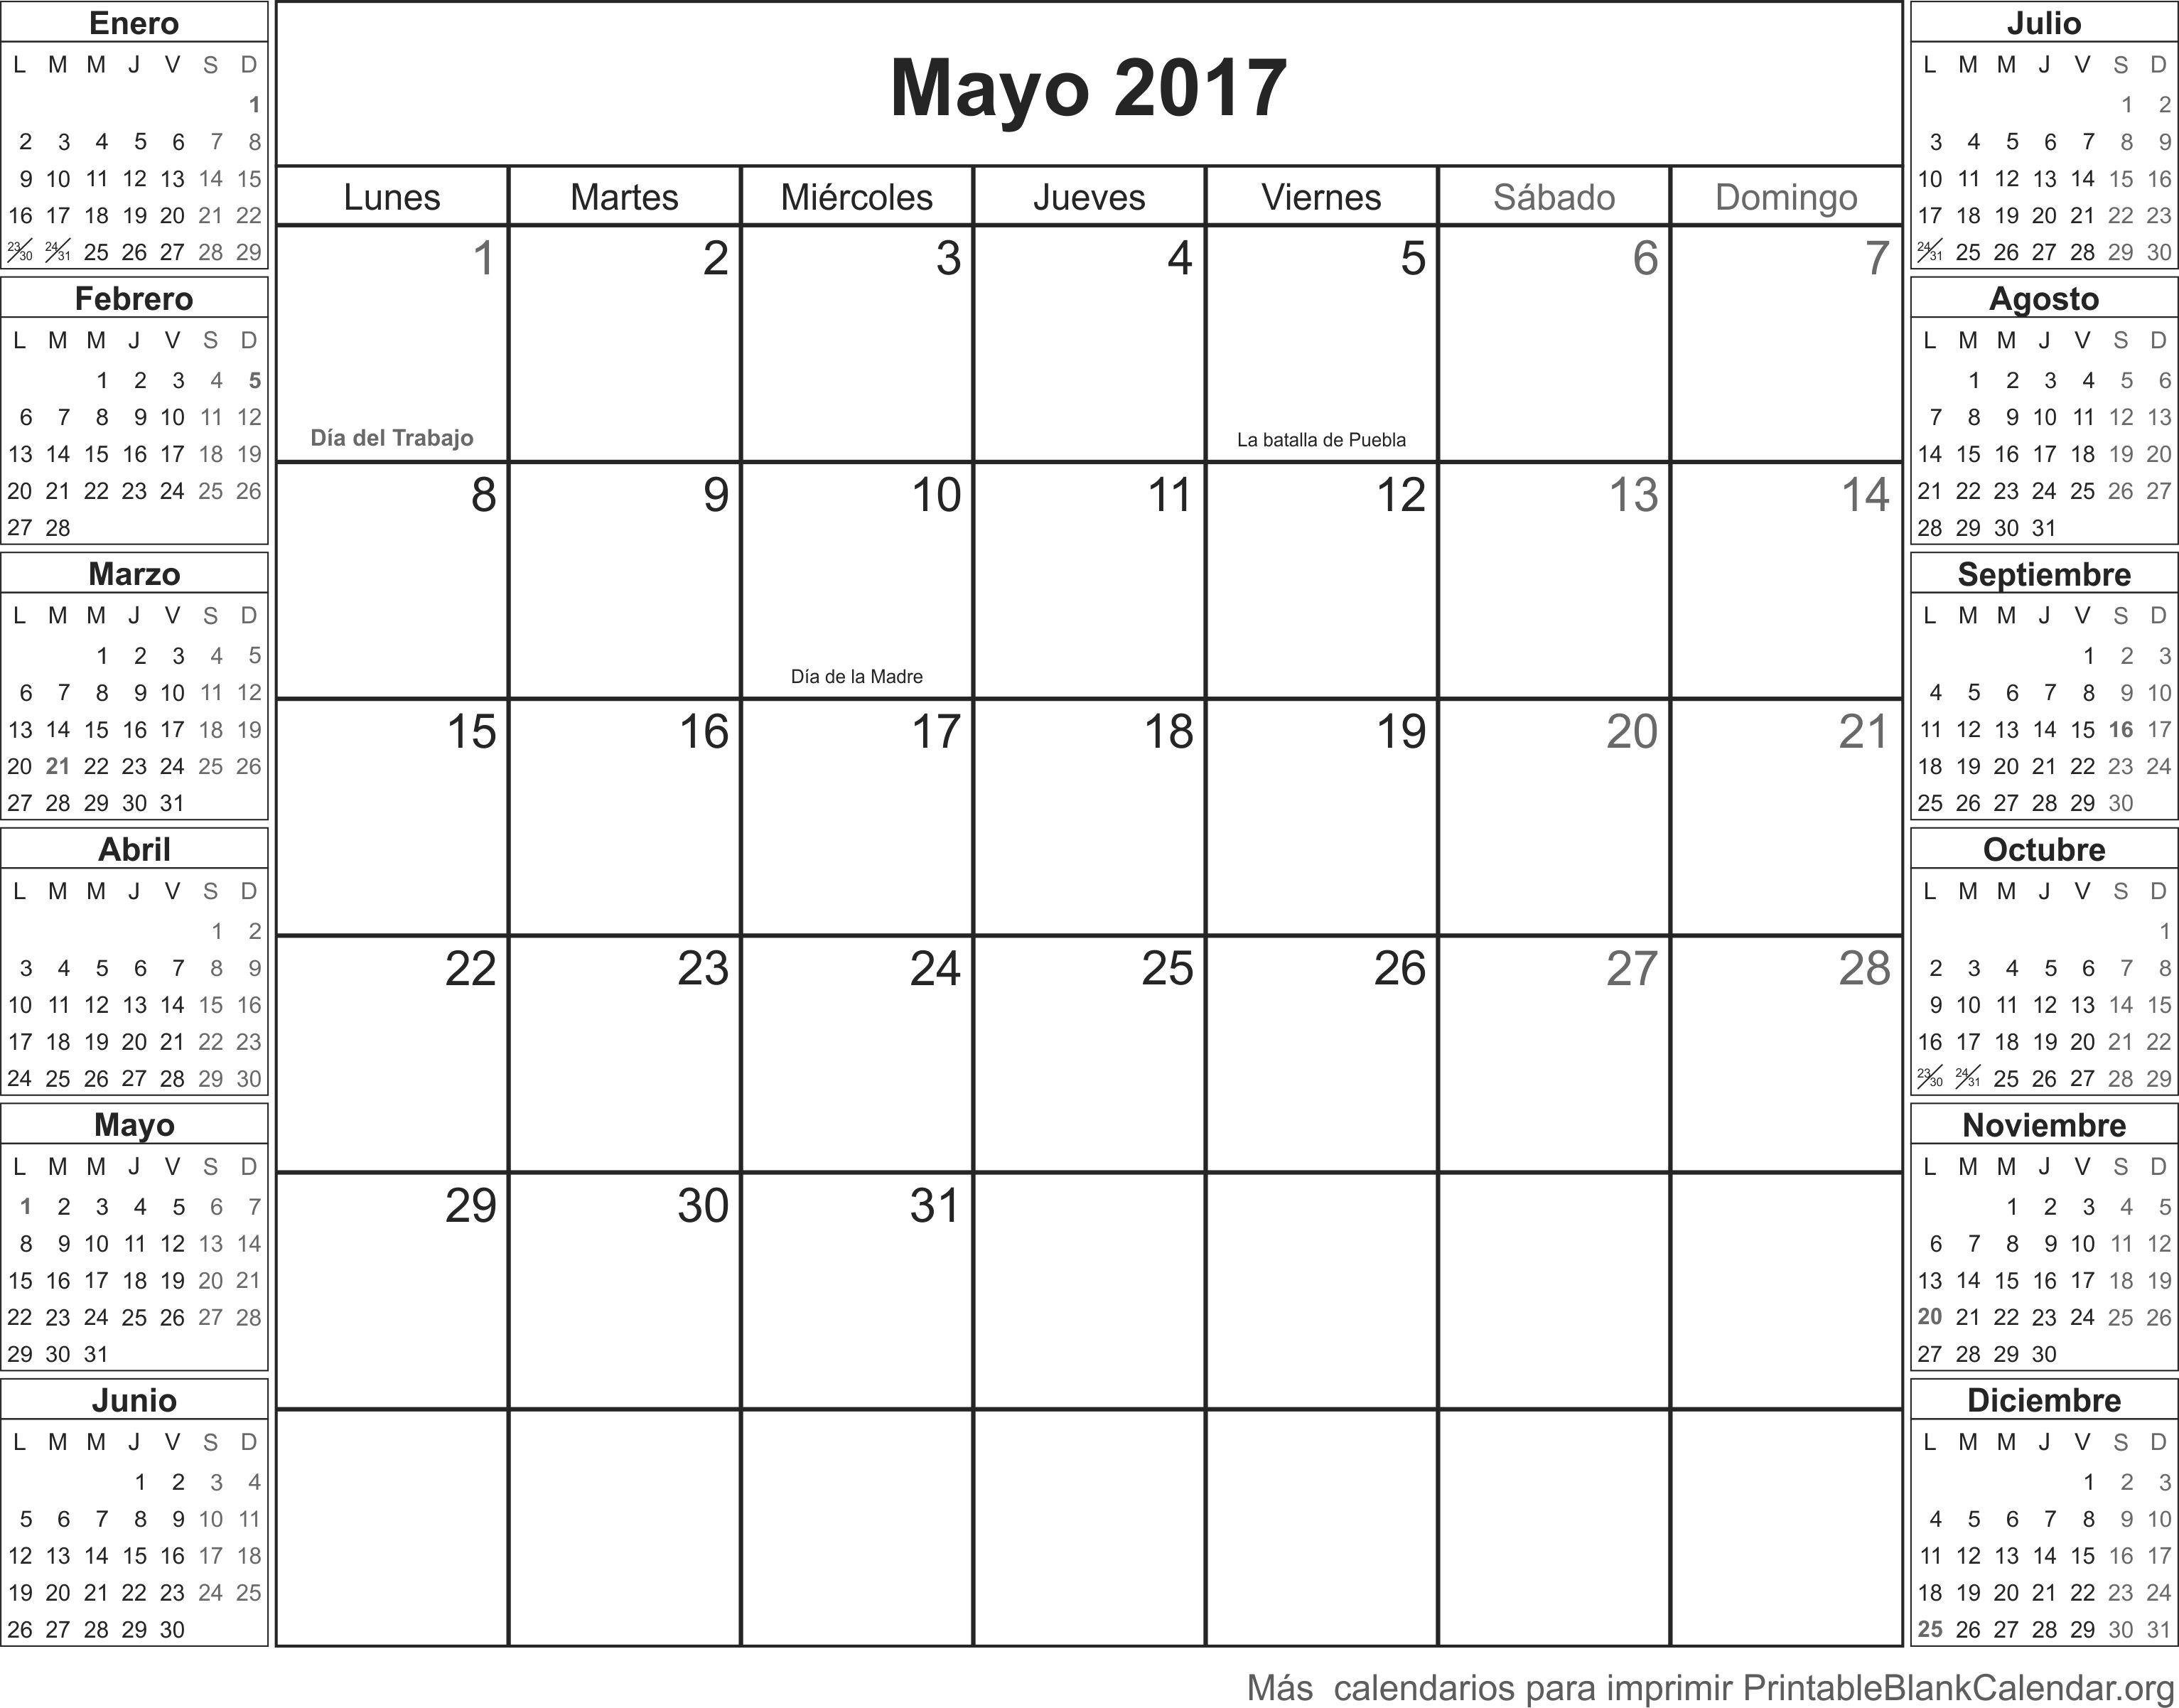 calendario para imprimir mayo 2017